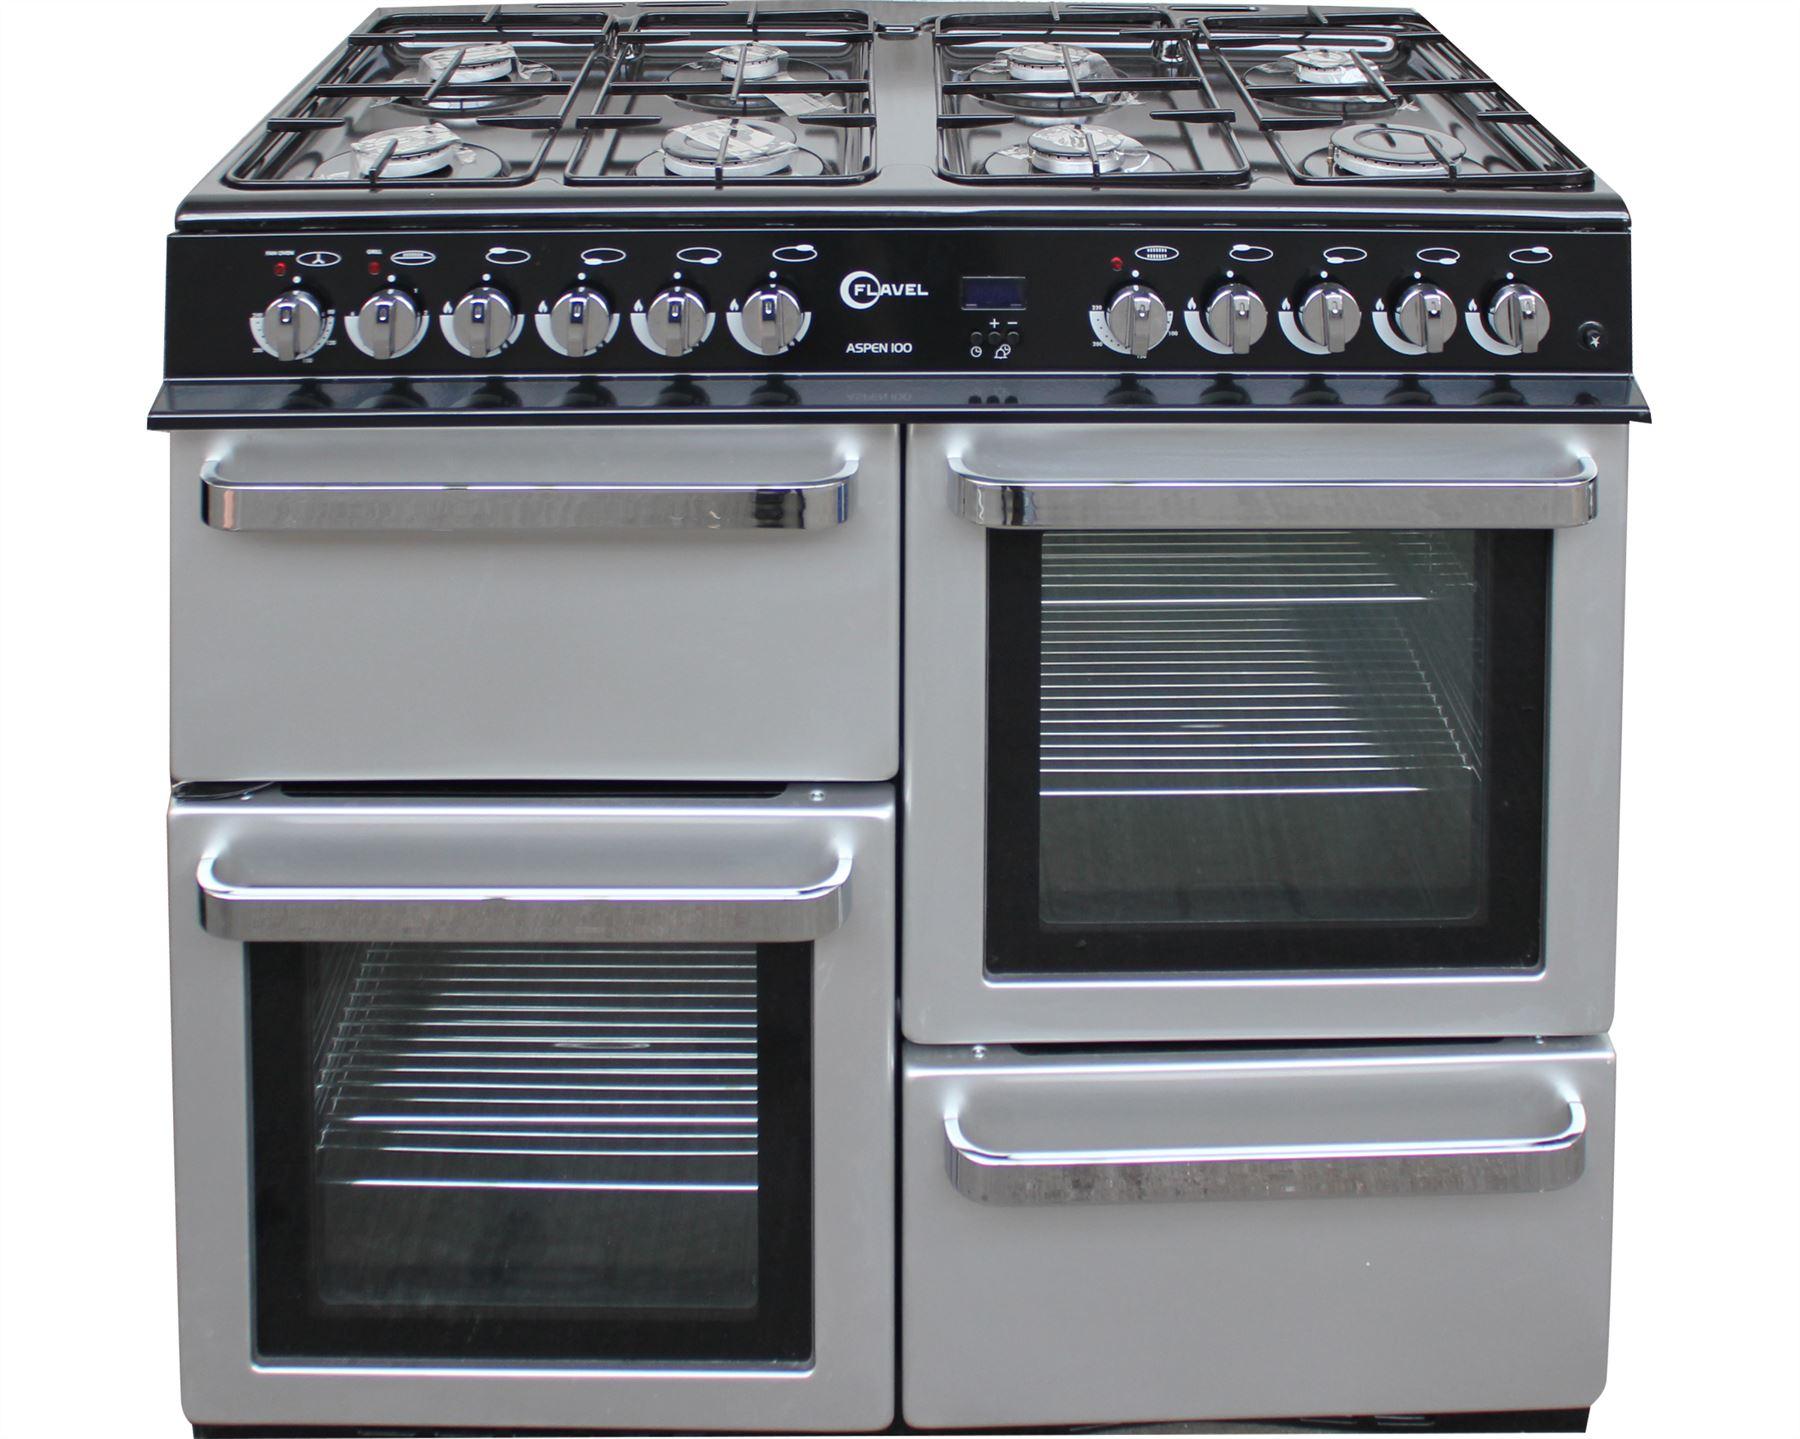 Double Double 100cm : Flavel range cooker dual fuel double oven burner